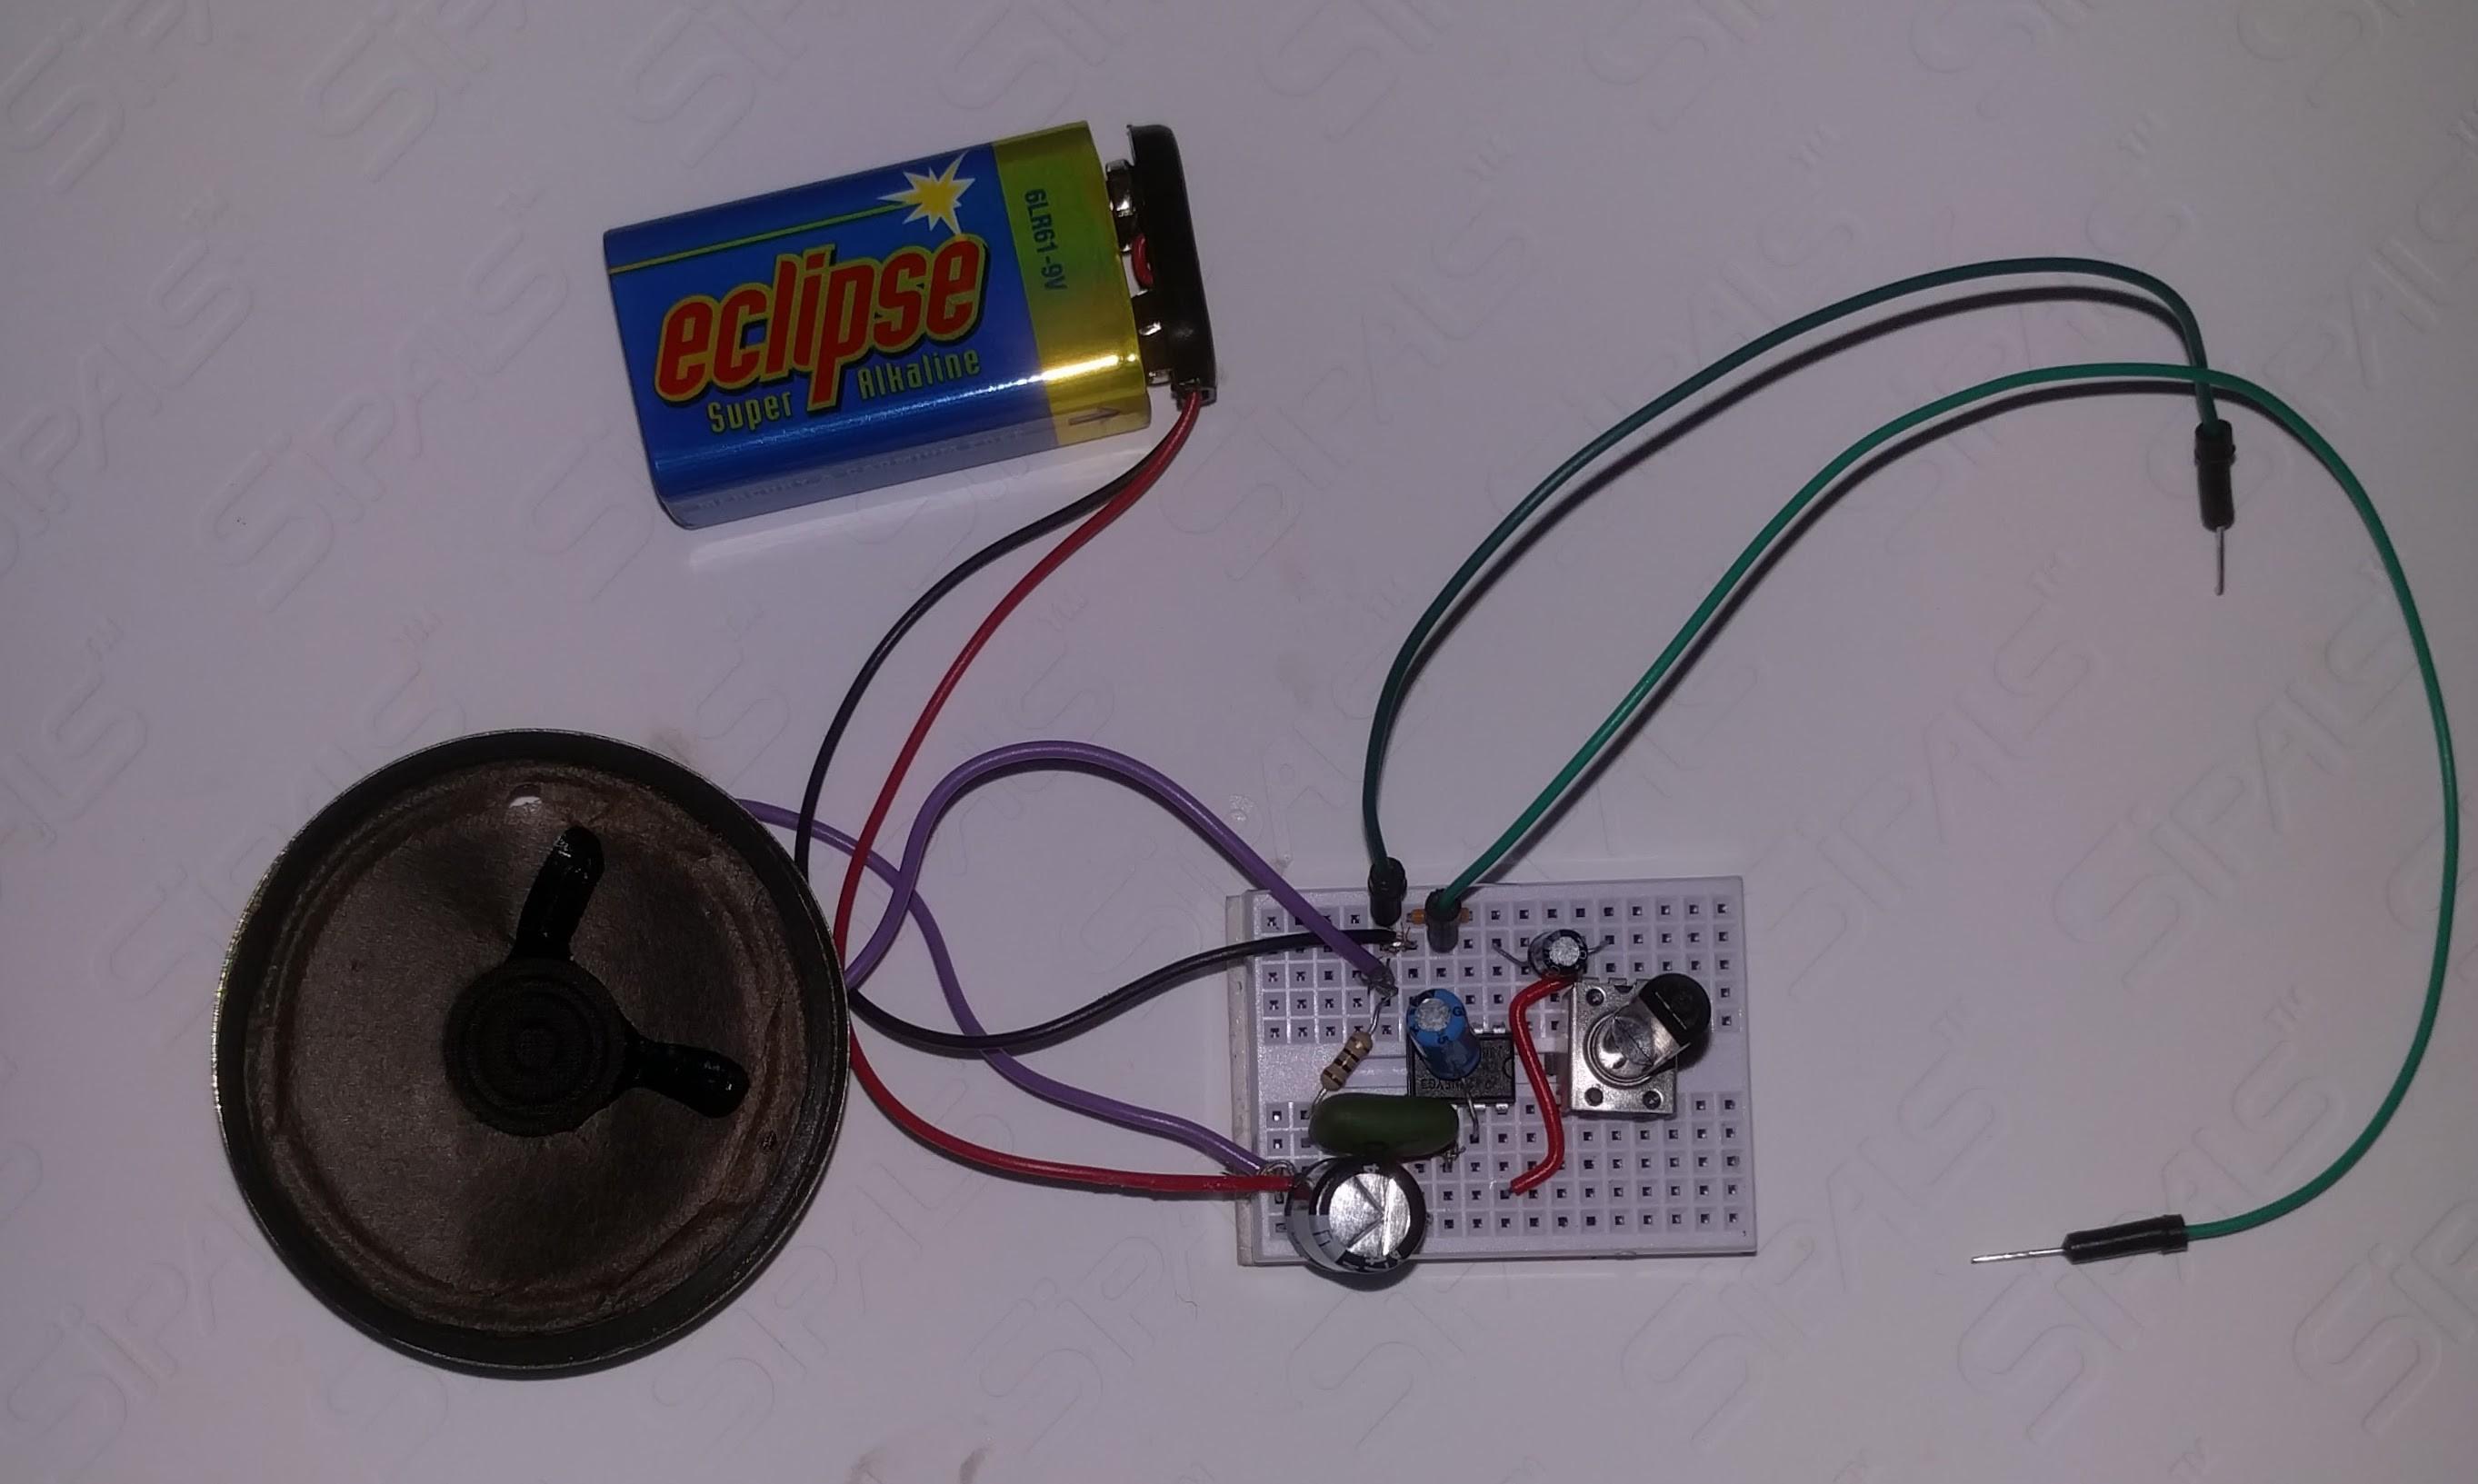 Ultrasonic Directional Speaker V1 Stage Sound Wiring Diagram It Plays Nouvelle Vague Just Fine